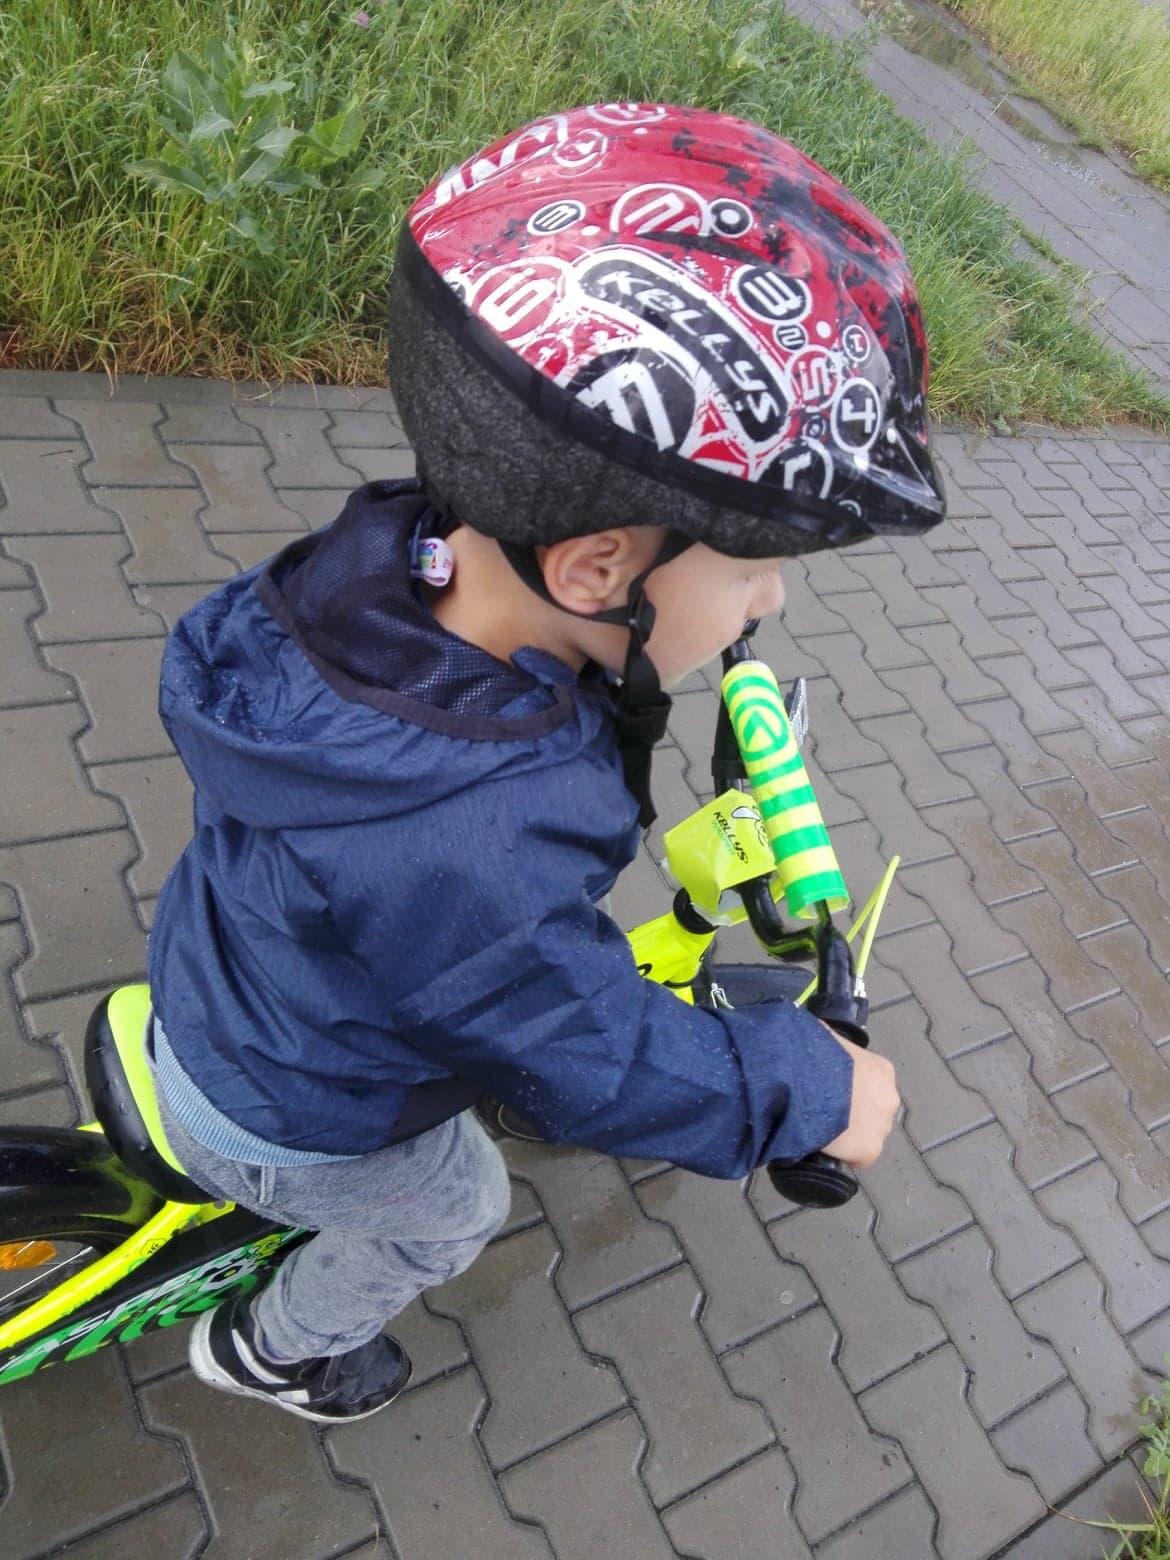 nauka jazdy na rowerze